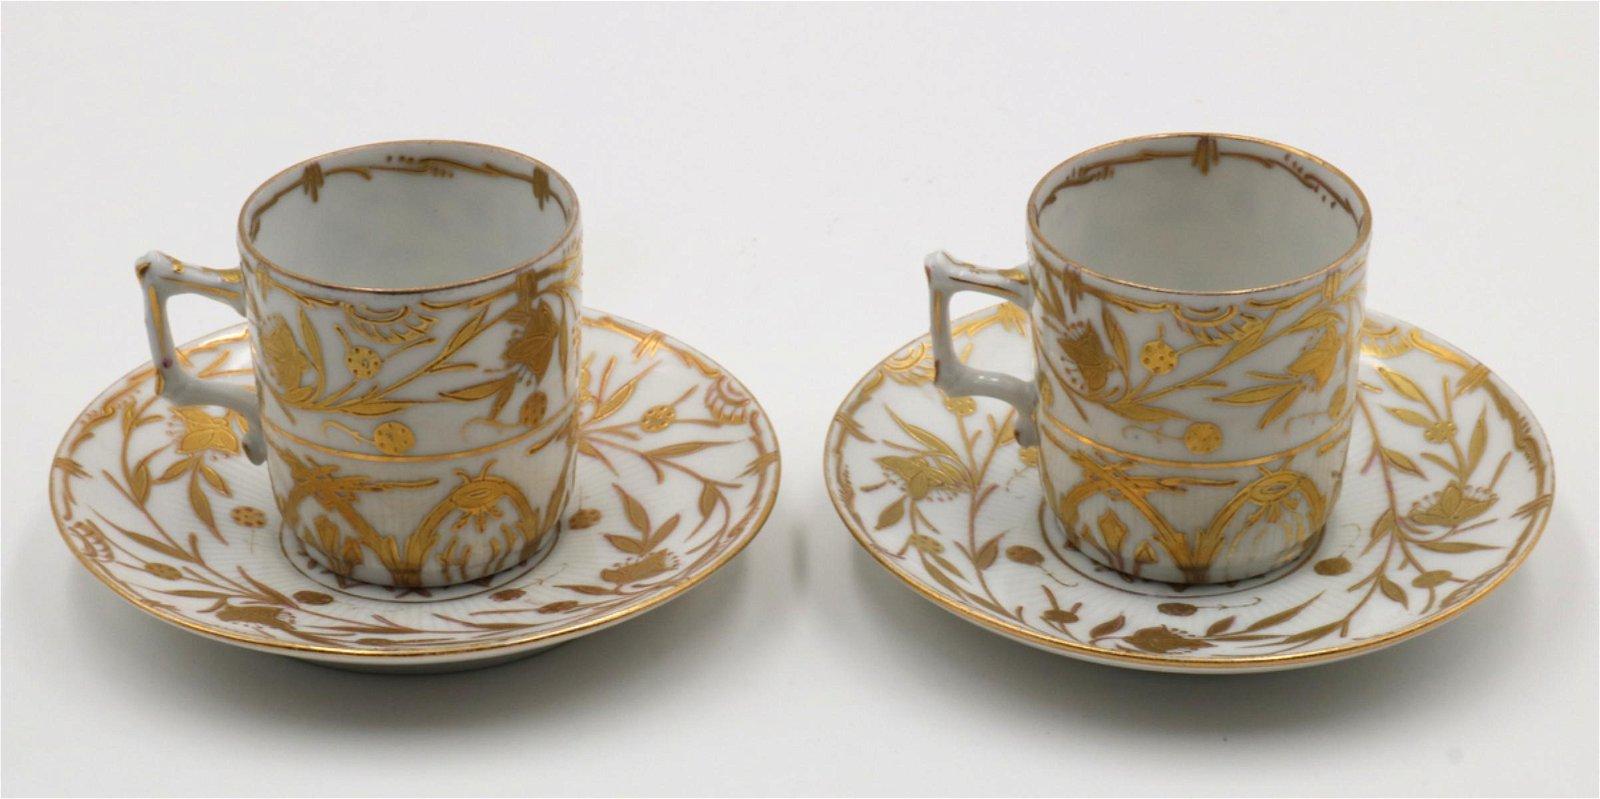 Ovington Bros. Austria Porcelain Cup & Saucers